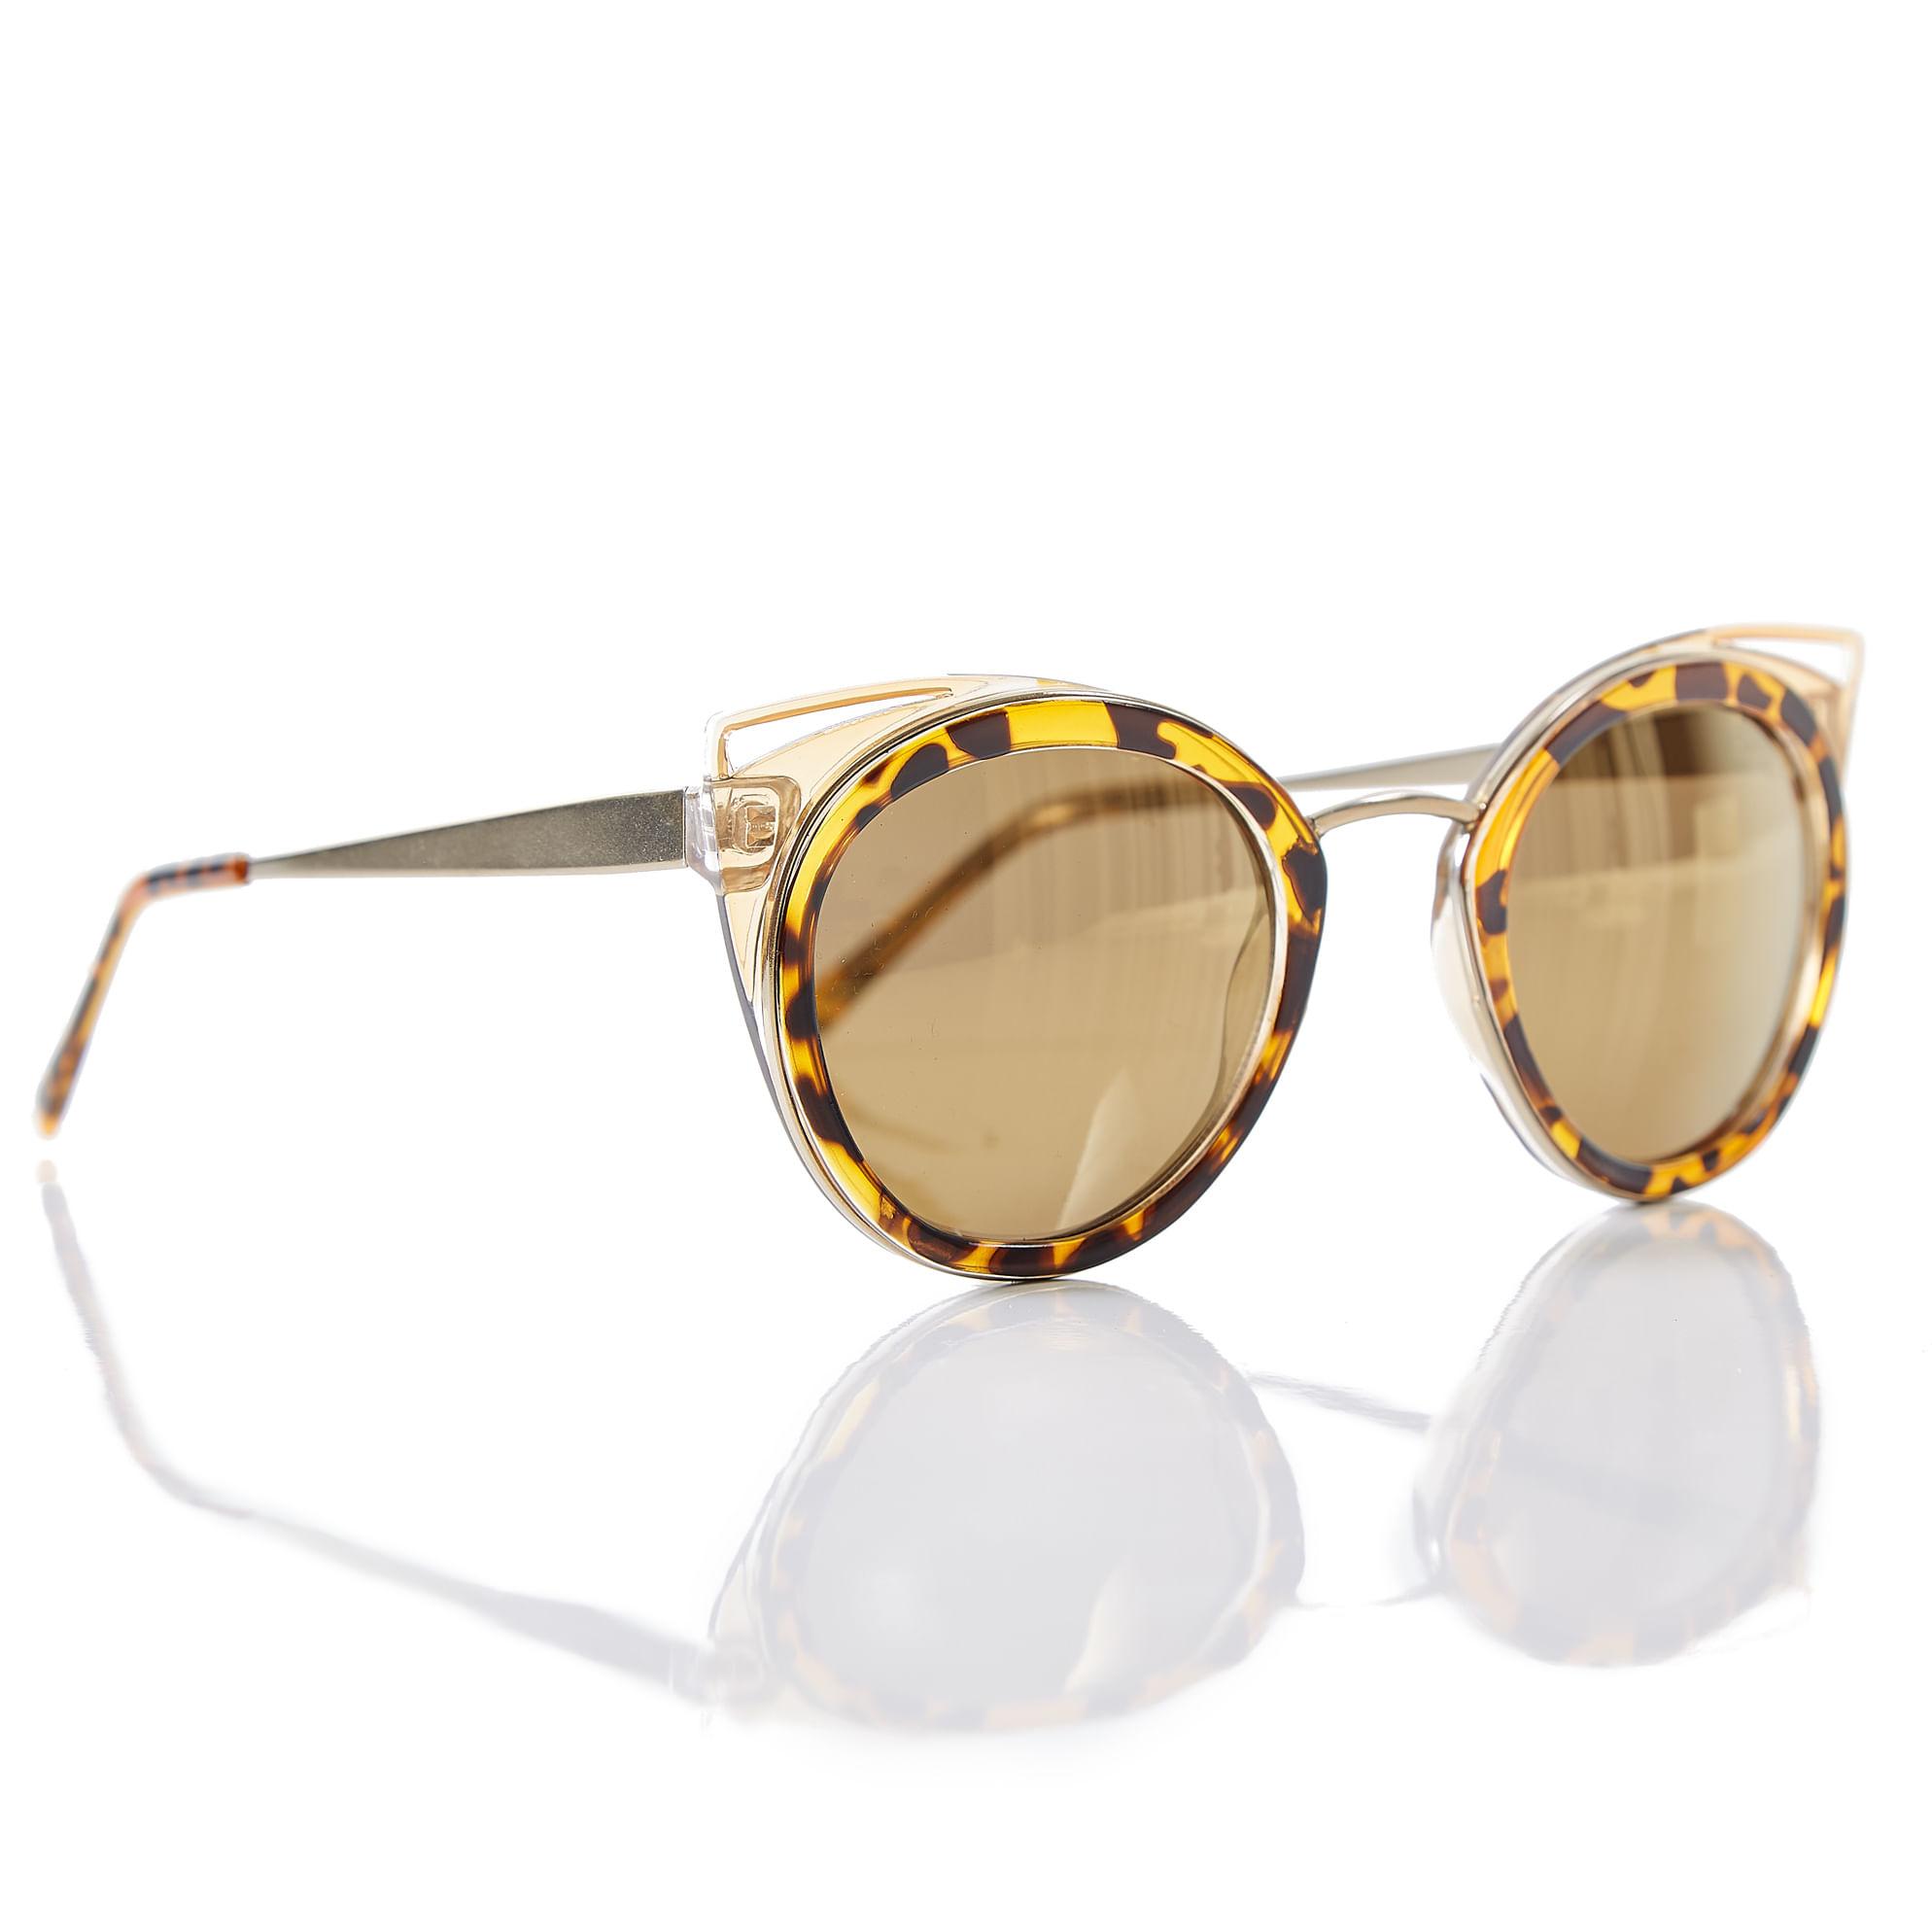 Oculos Gatinho Lateral Vazada Marrom - morenarosa 87fe2cff7b